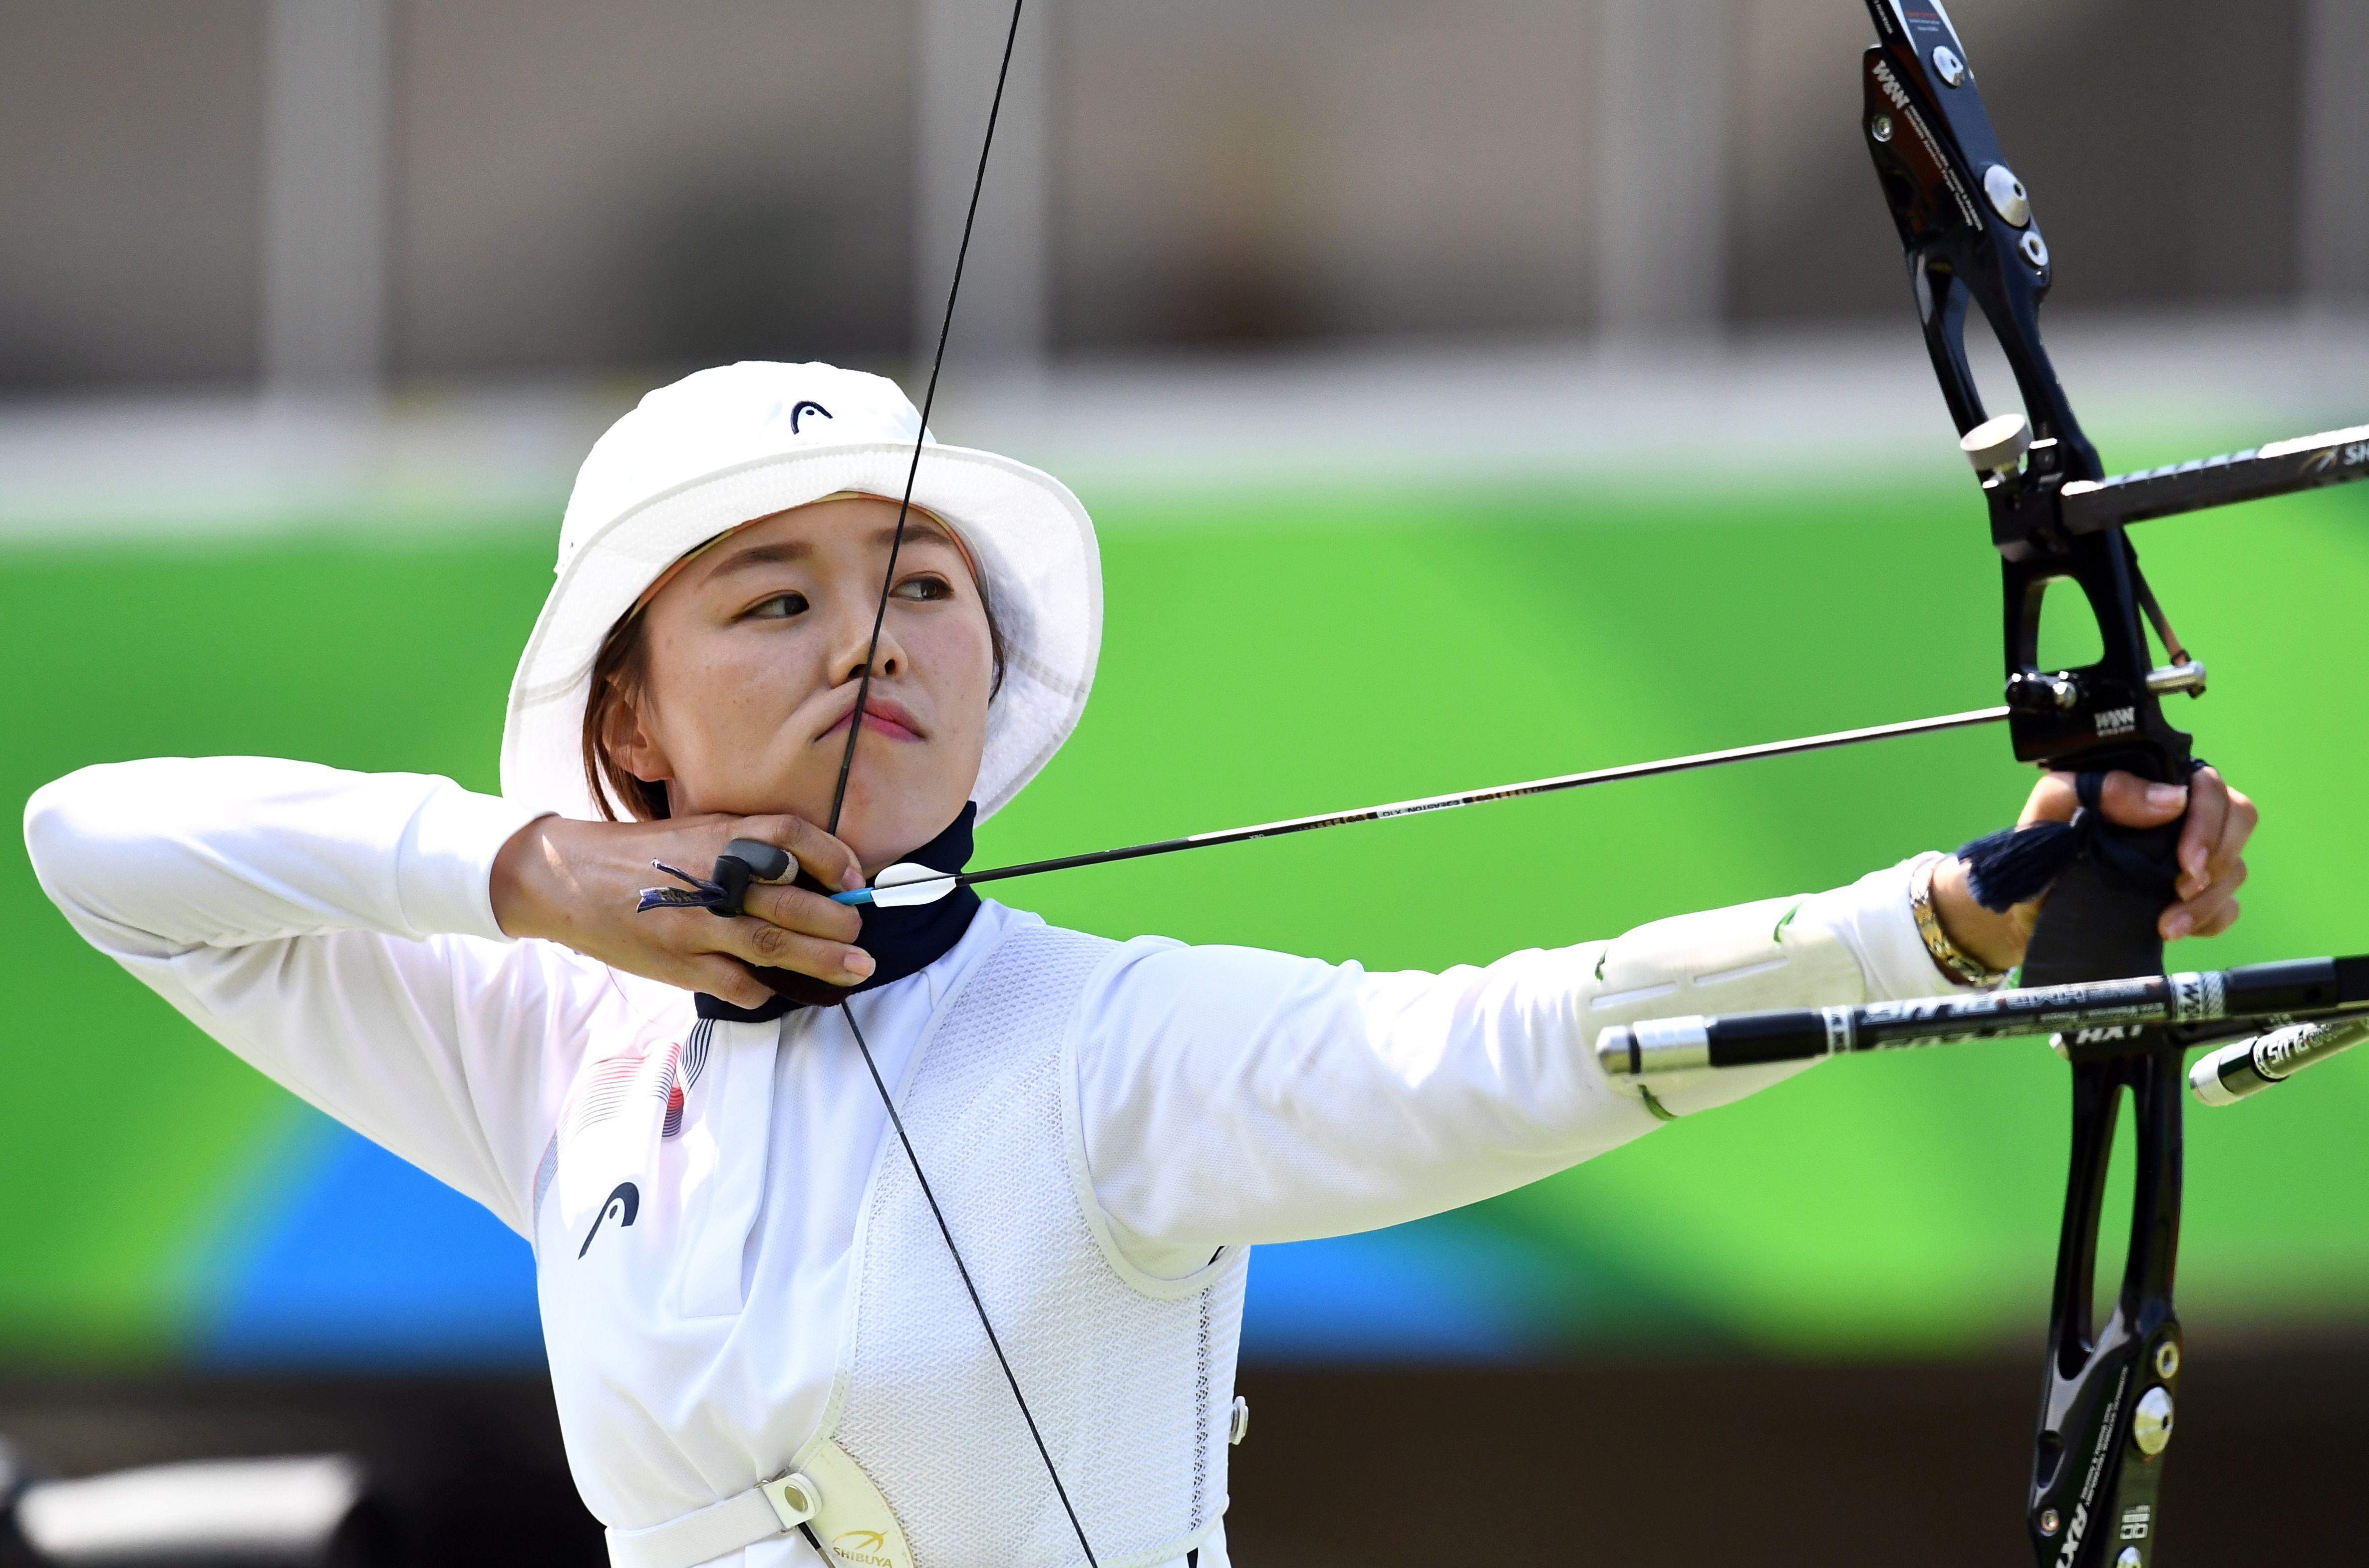 Olympics Archery 2016 live stream: Watch online – August 11